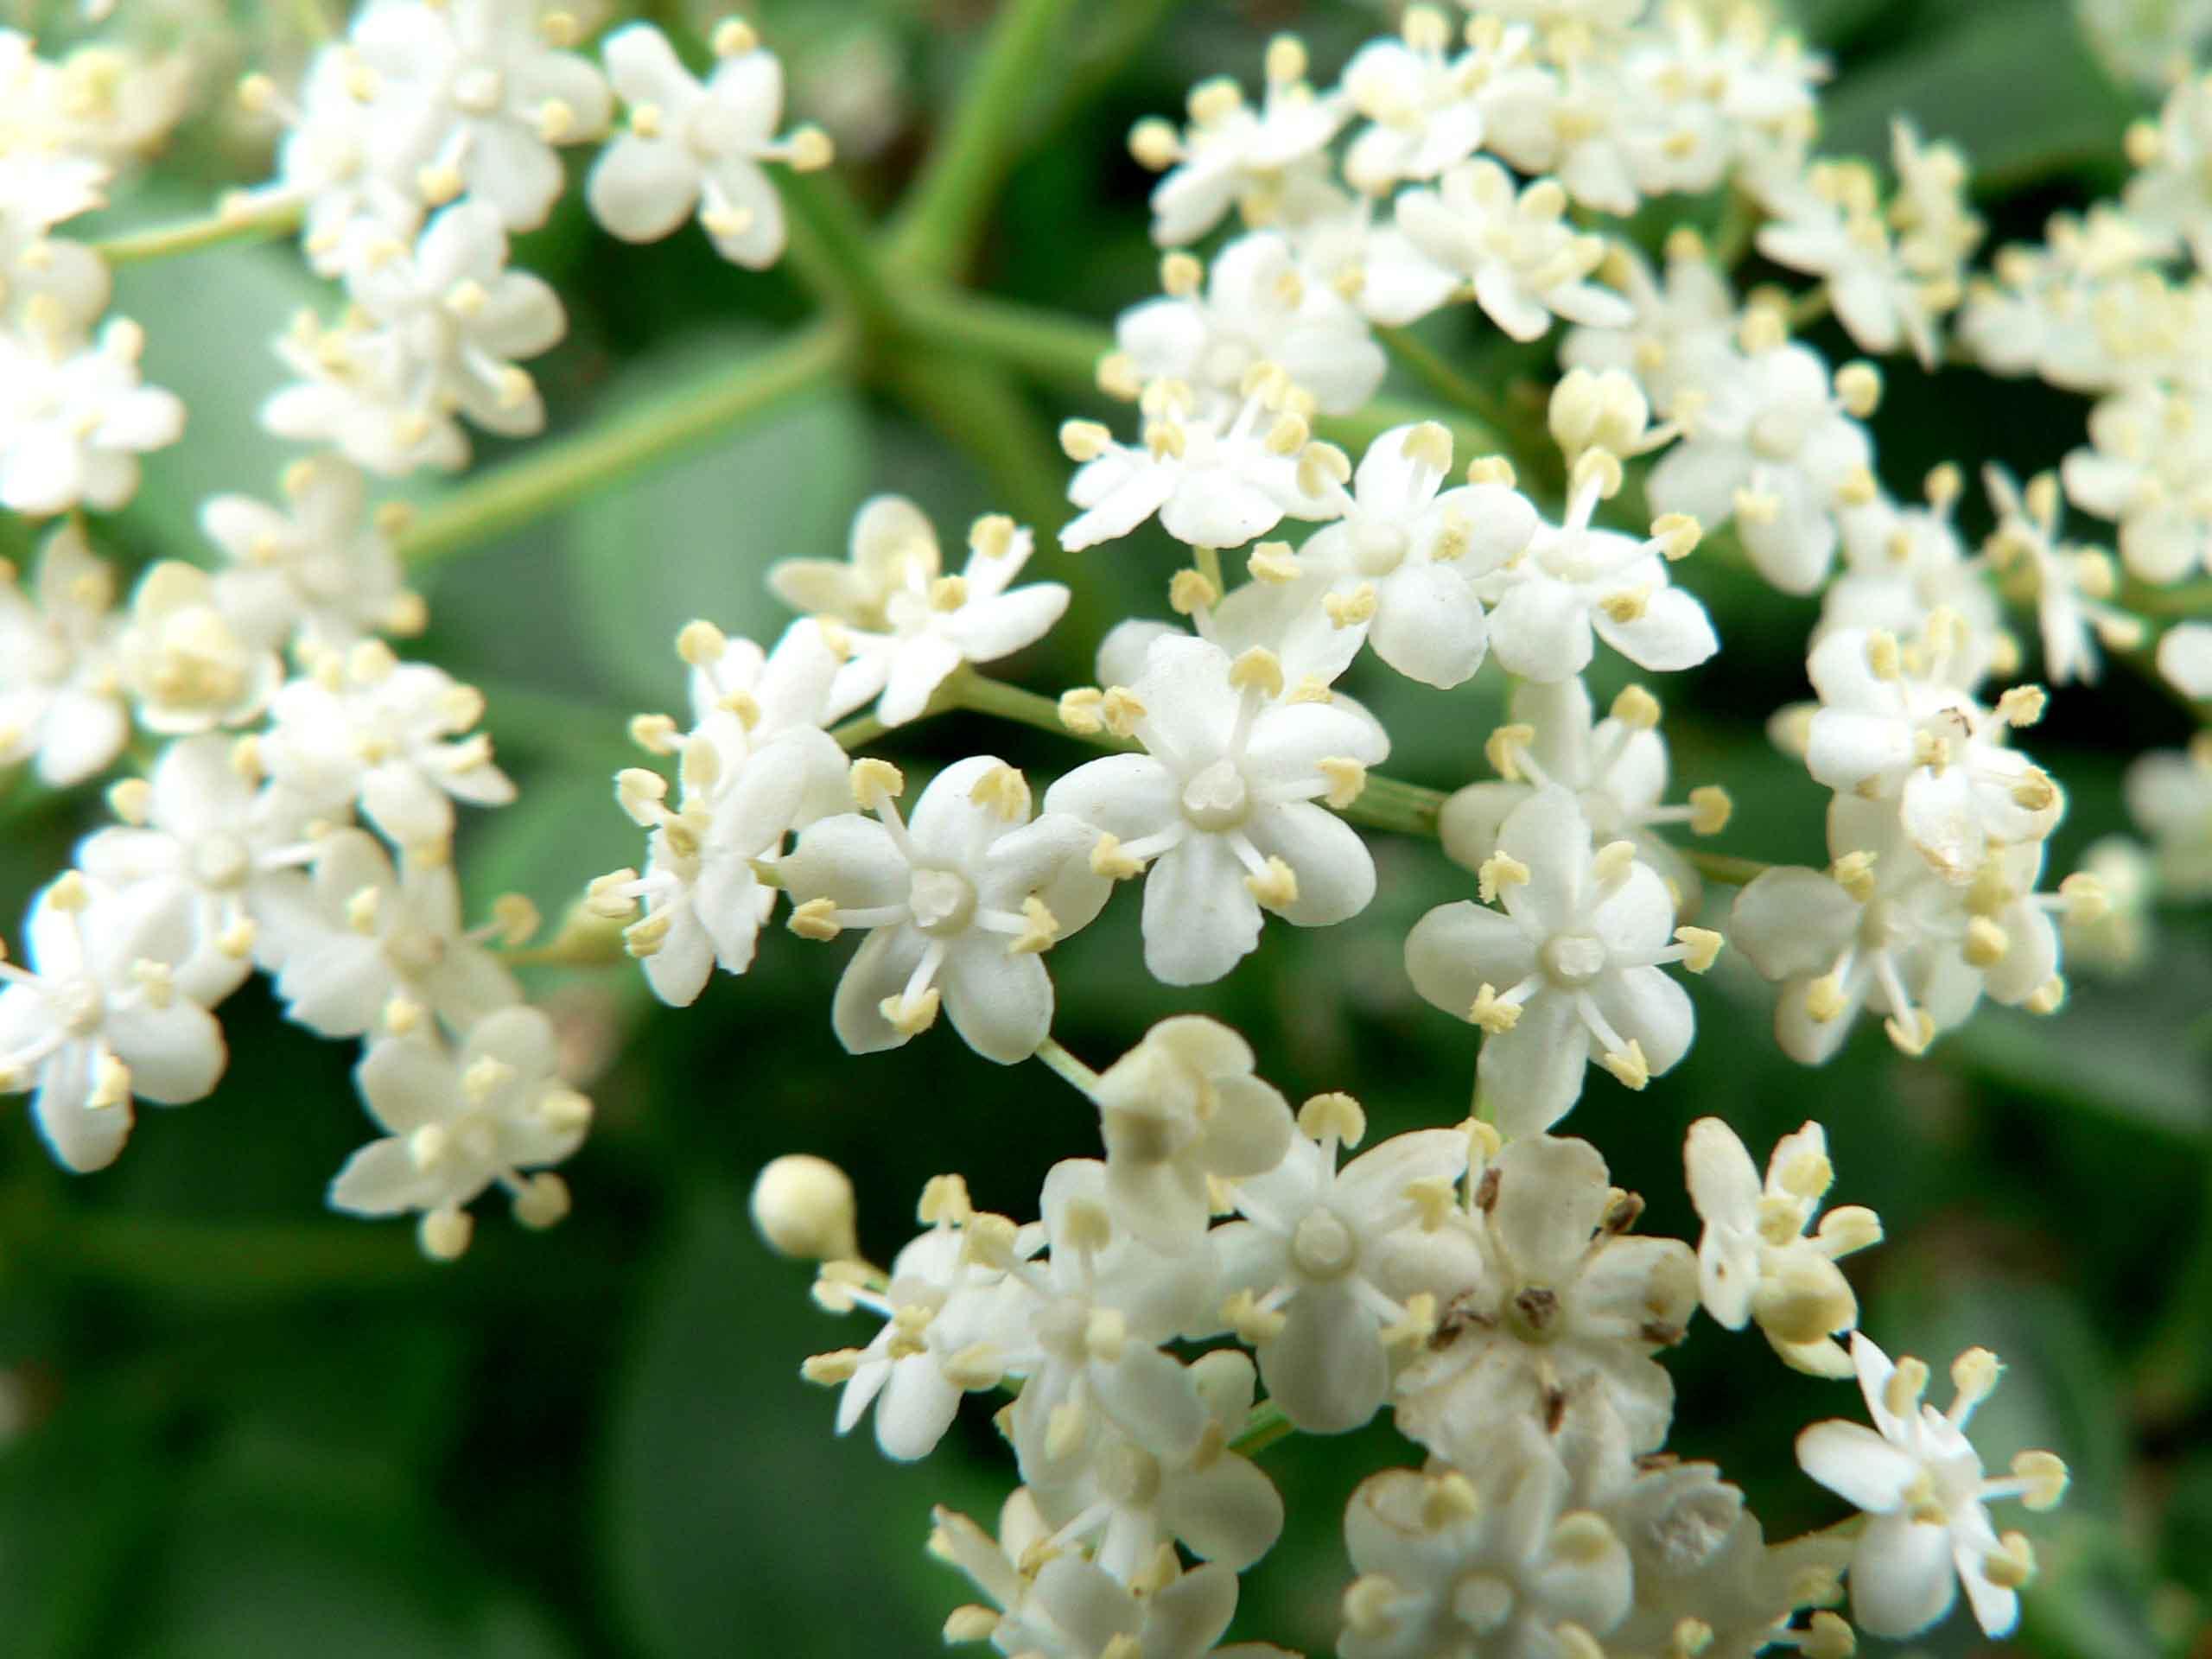 Types of Elderflower